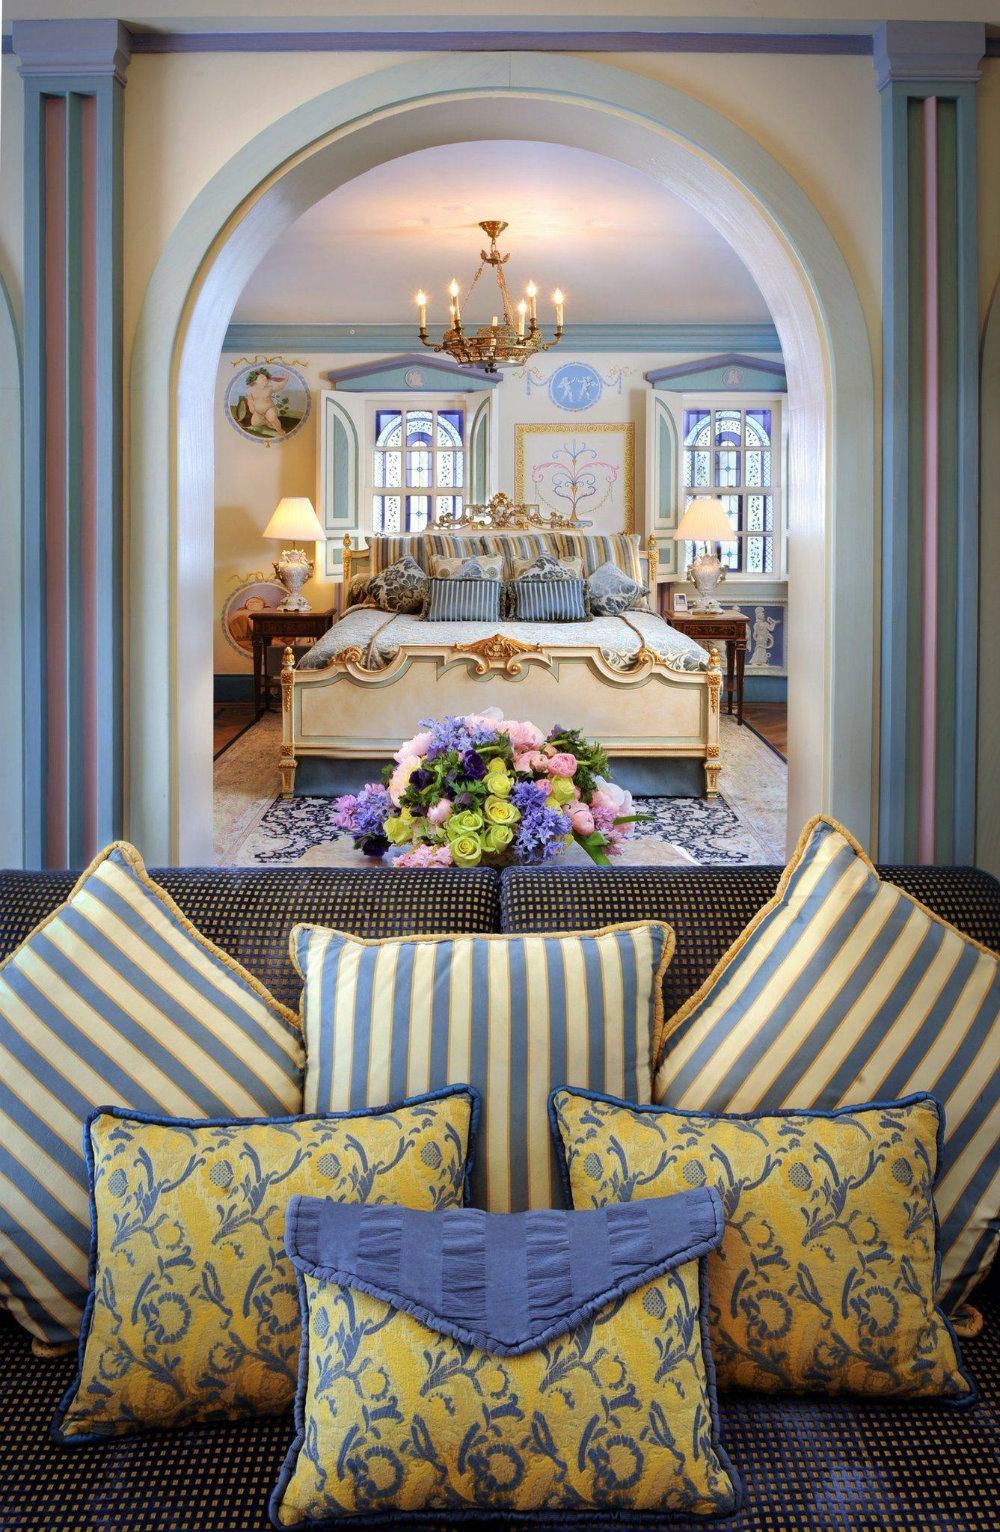 luxury hotel Gianni Versace Miami Mansion Is Now A Luxury Hotel Gianni Vesace Miami Mansion Is Now A Luxury Hotel 06